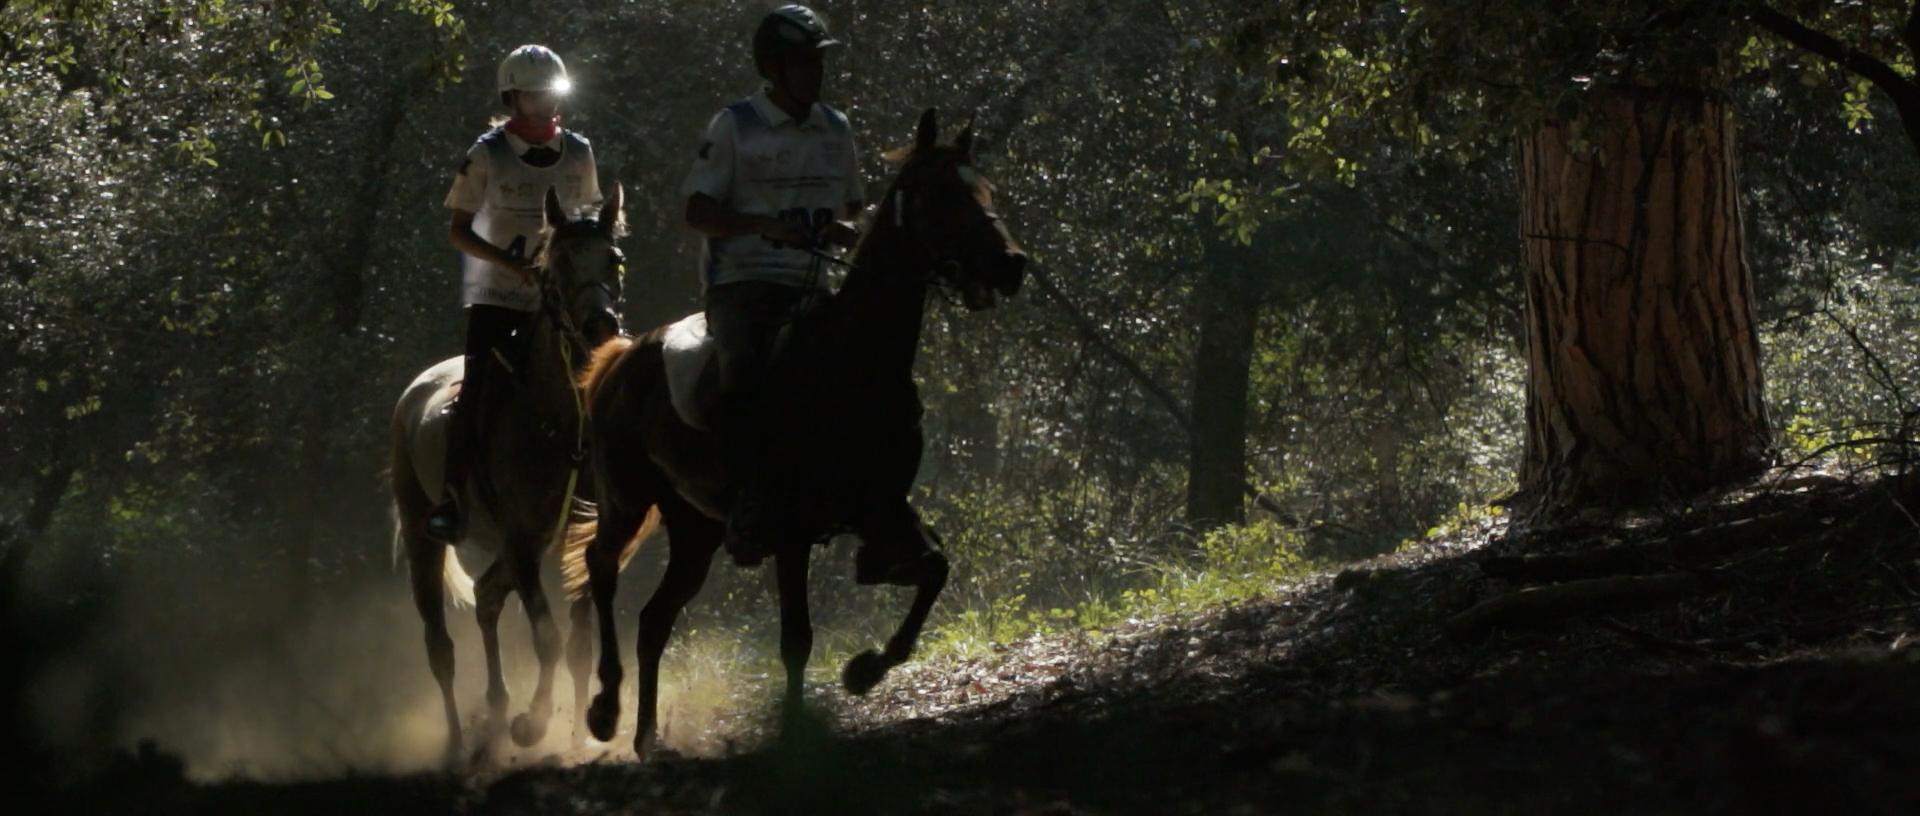 Toscana Endurance Lifestyle 2018